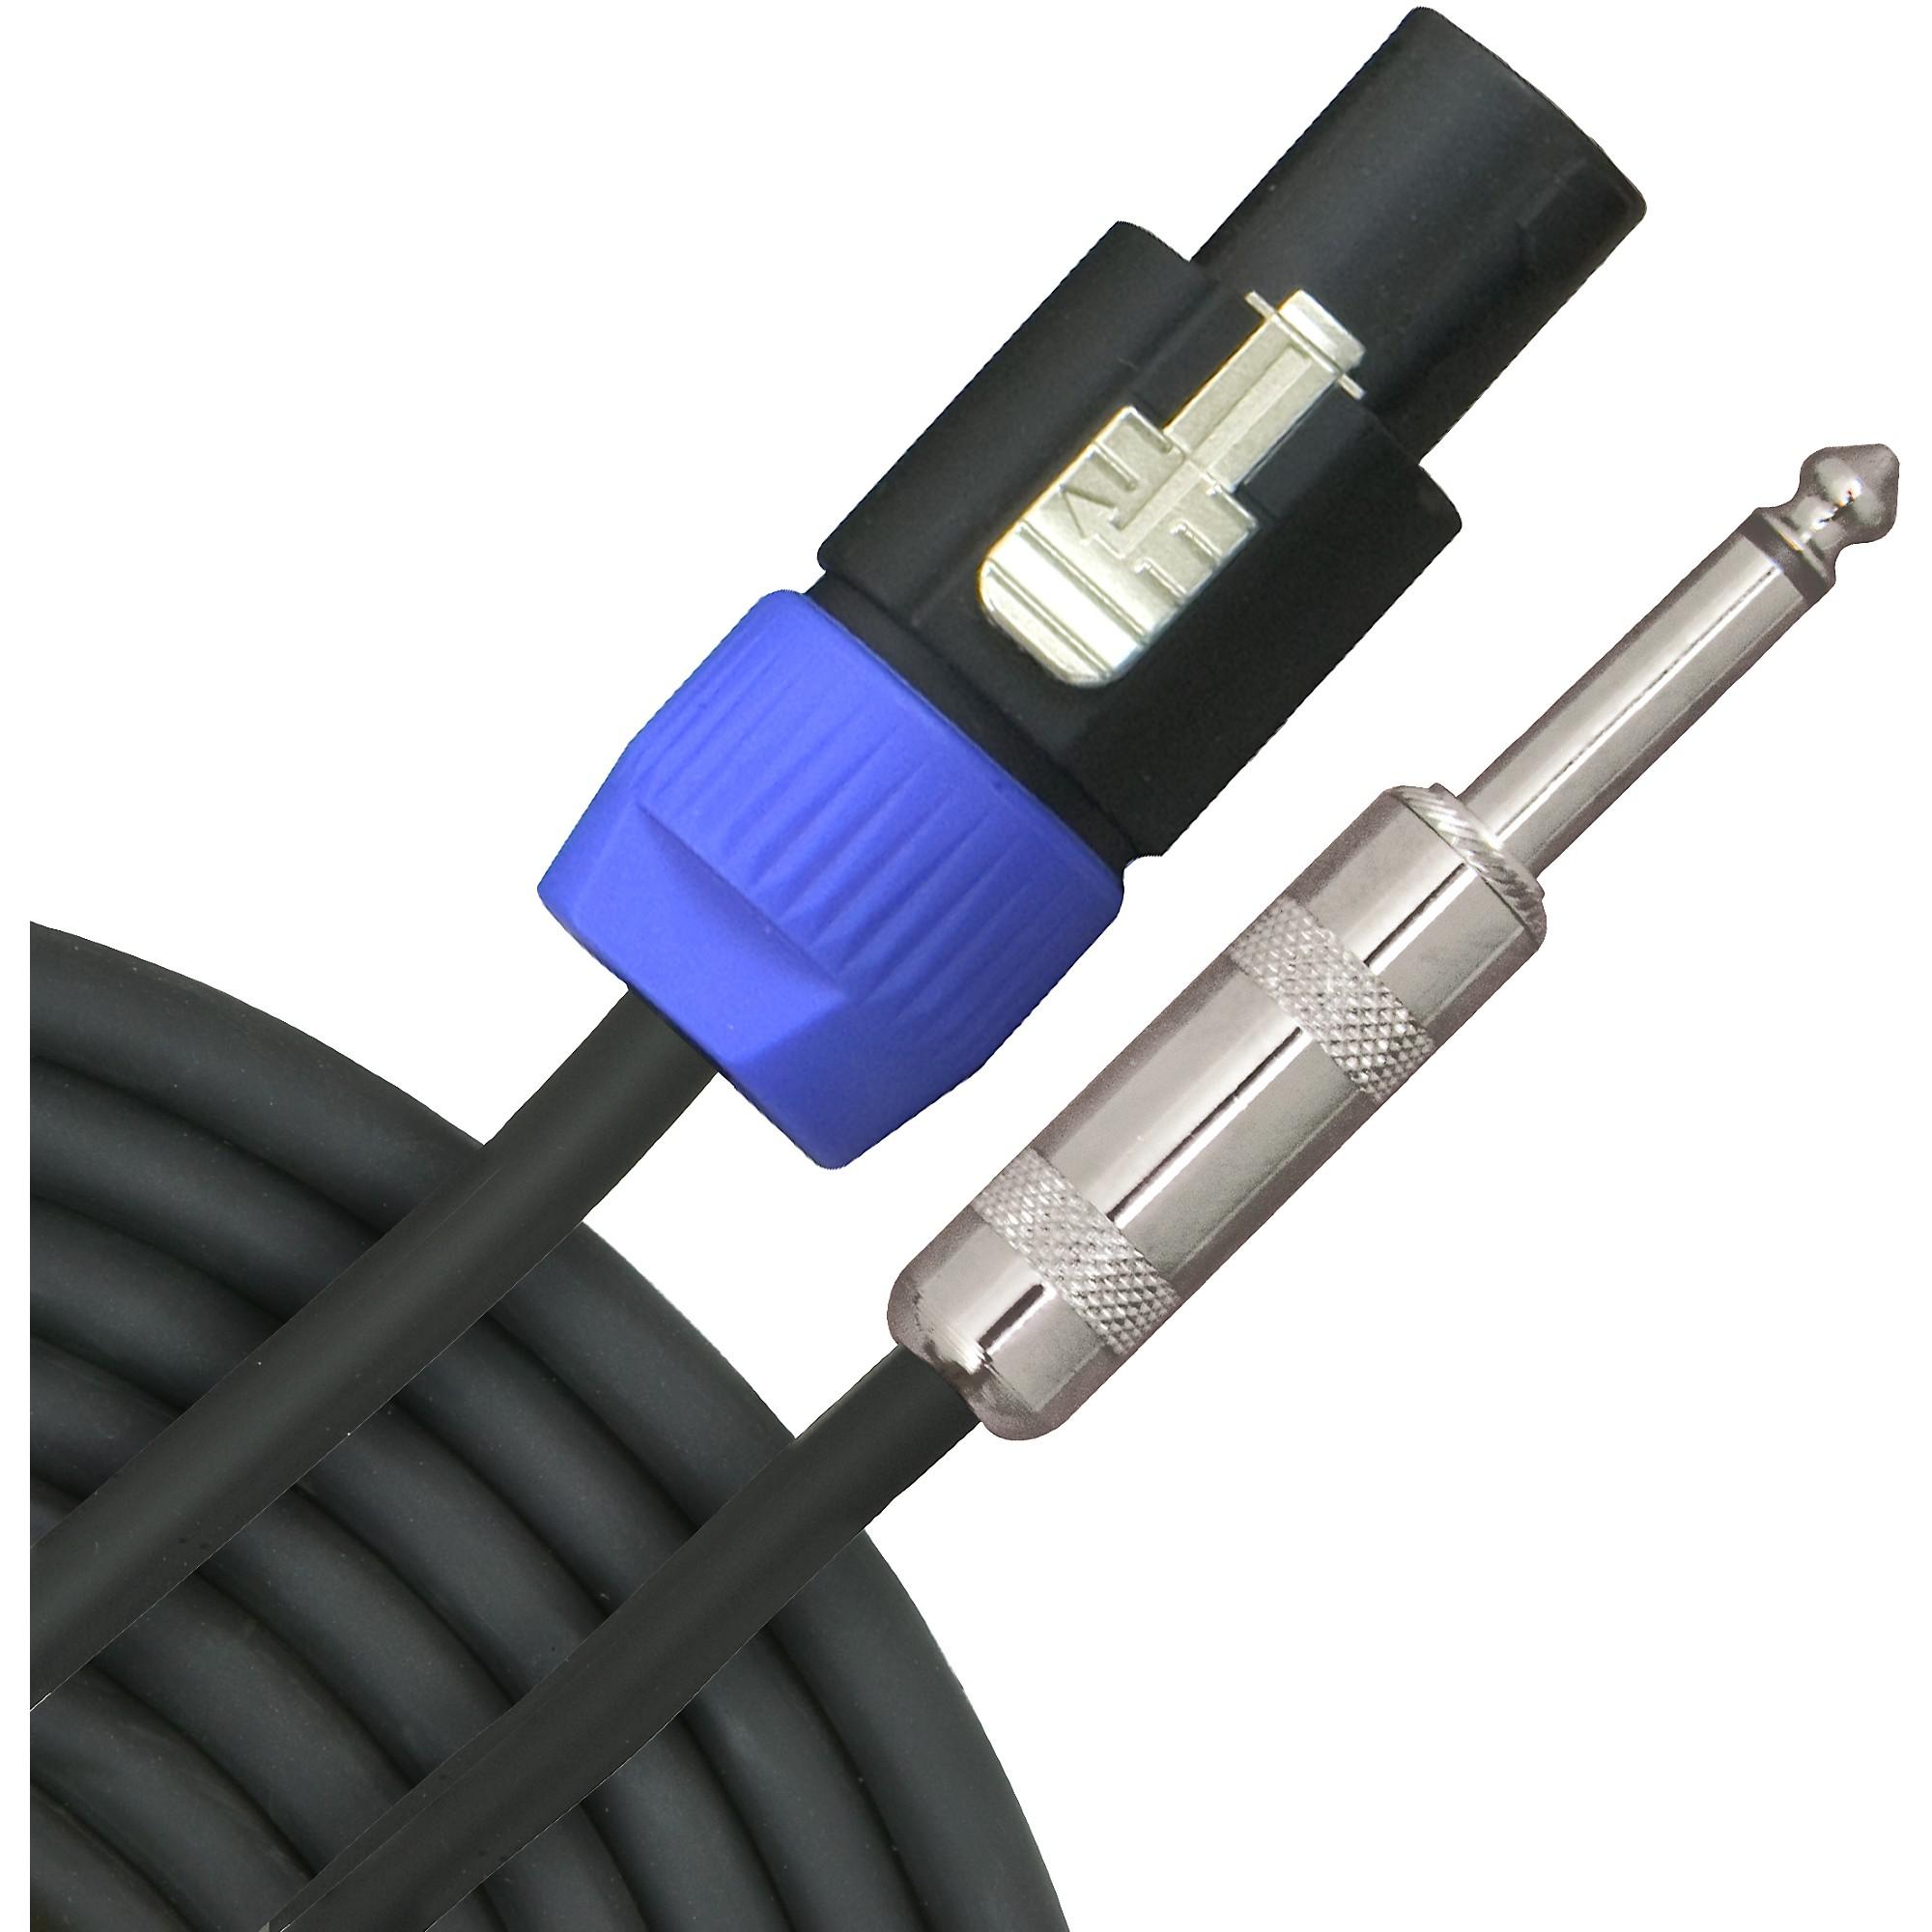 "Livewire Elite 12-Gauge Speakon to 1/4"" 2-Pole Speaker Cable"